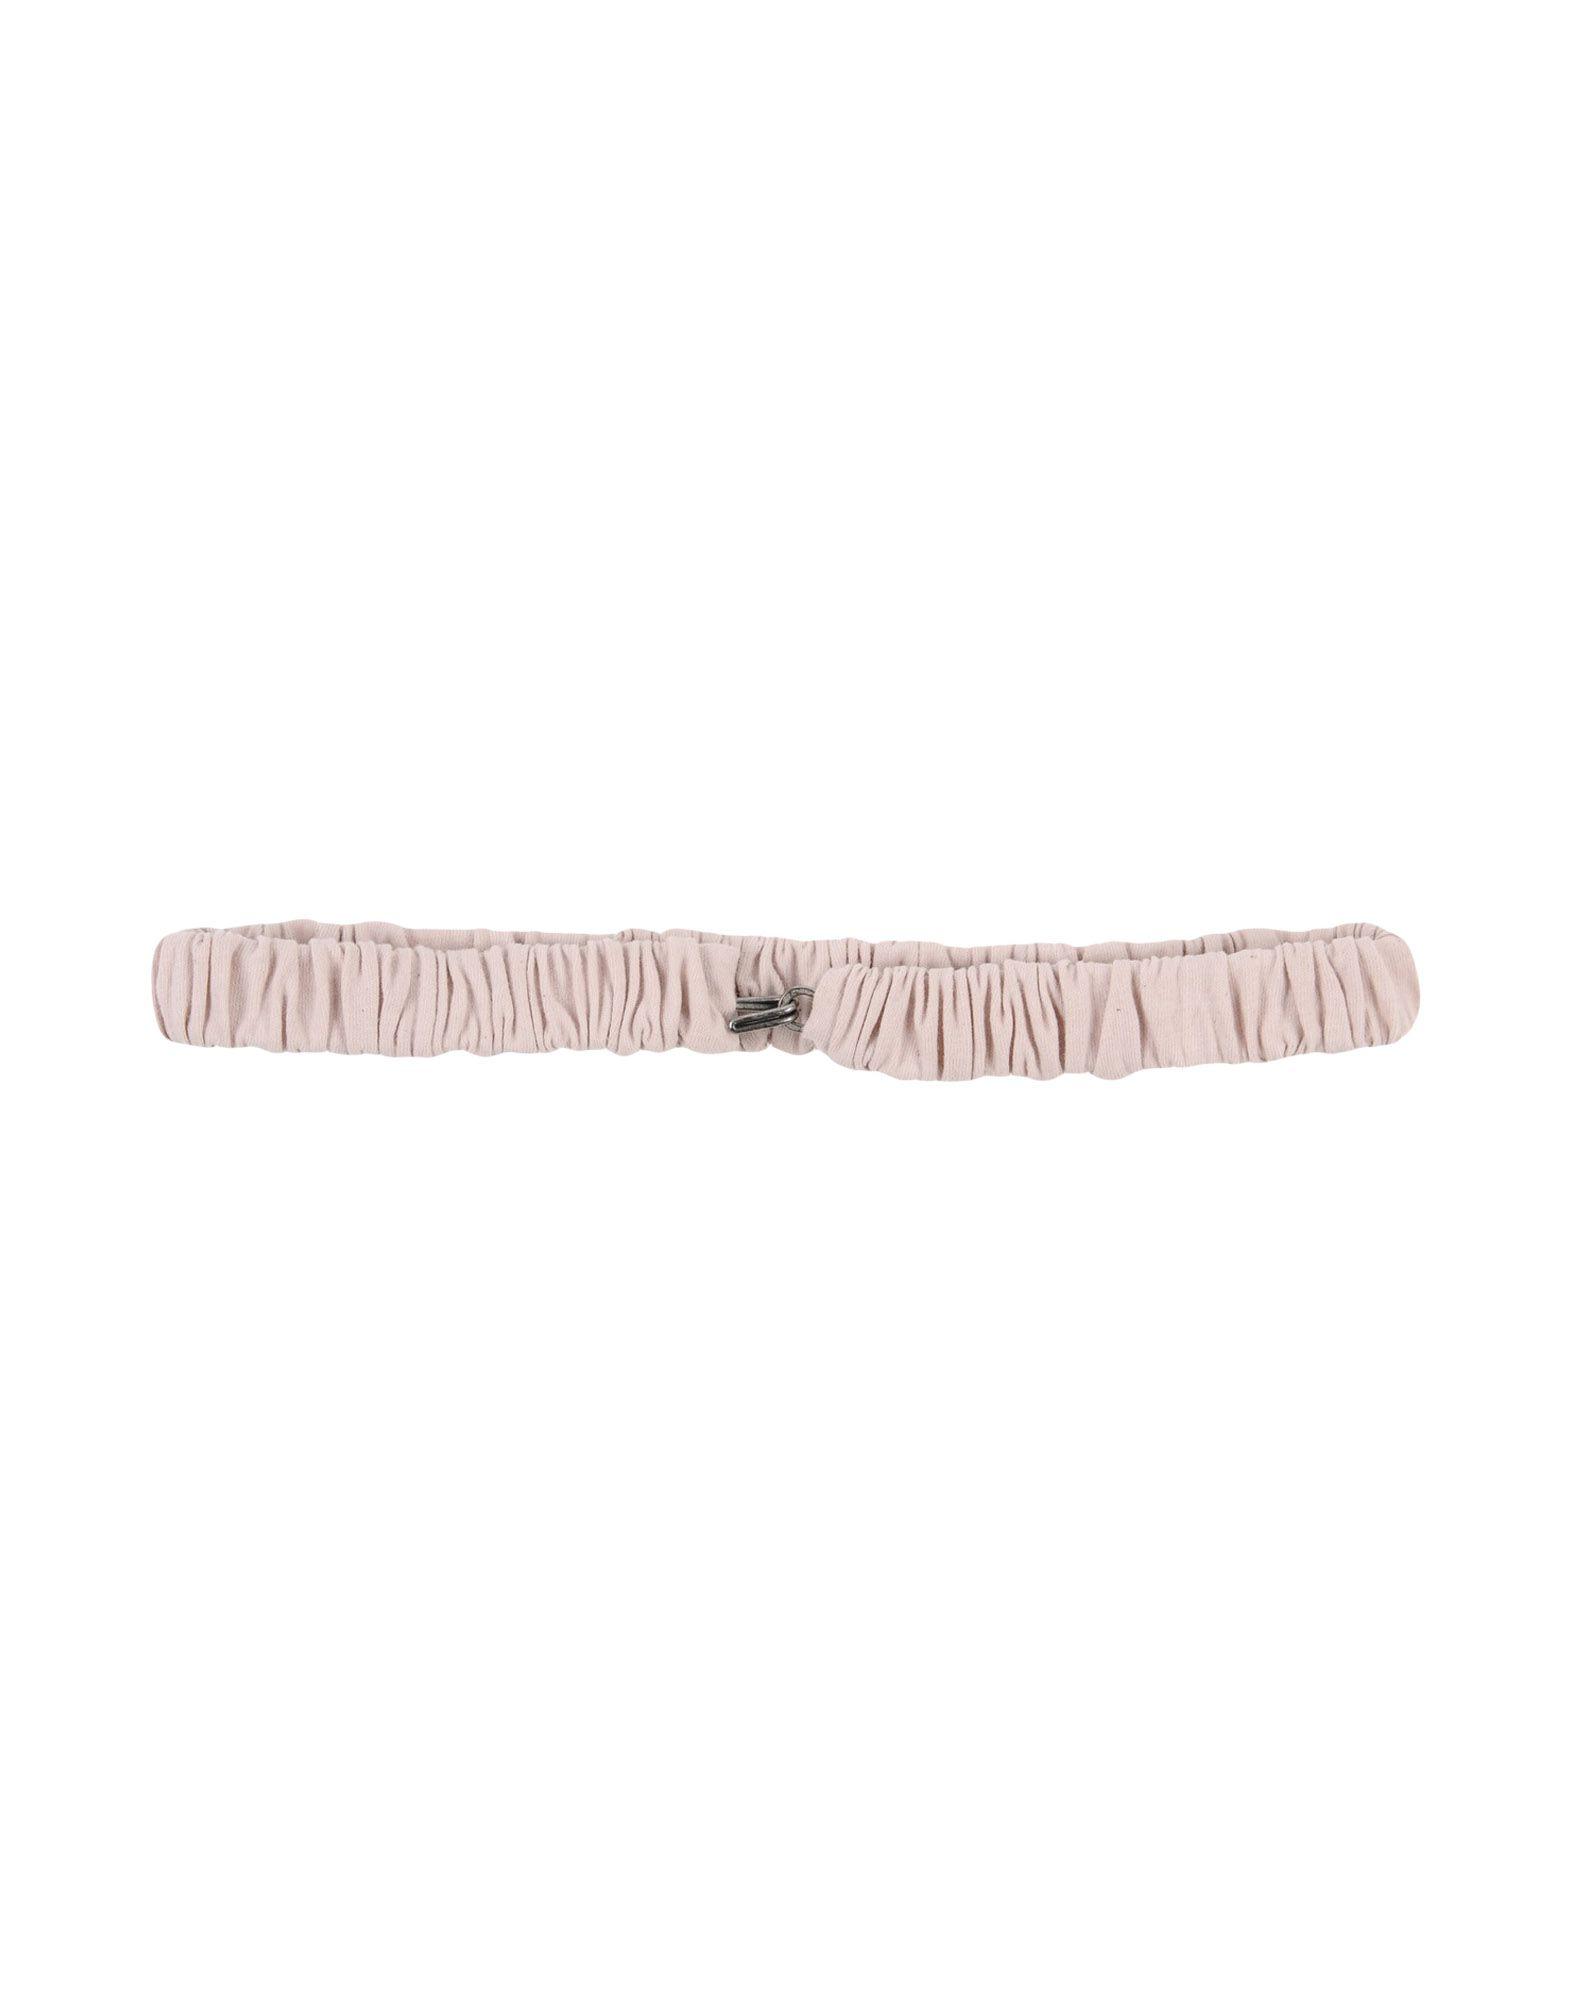 DOUUOD Thin Belt in Light Pink